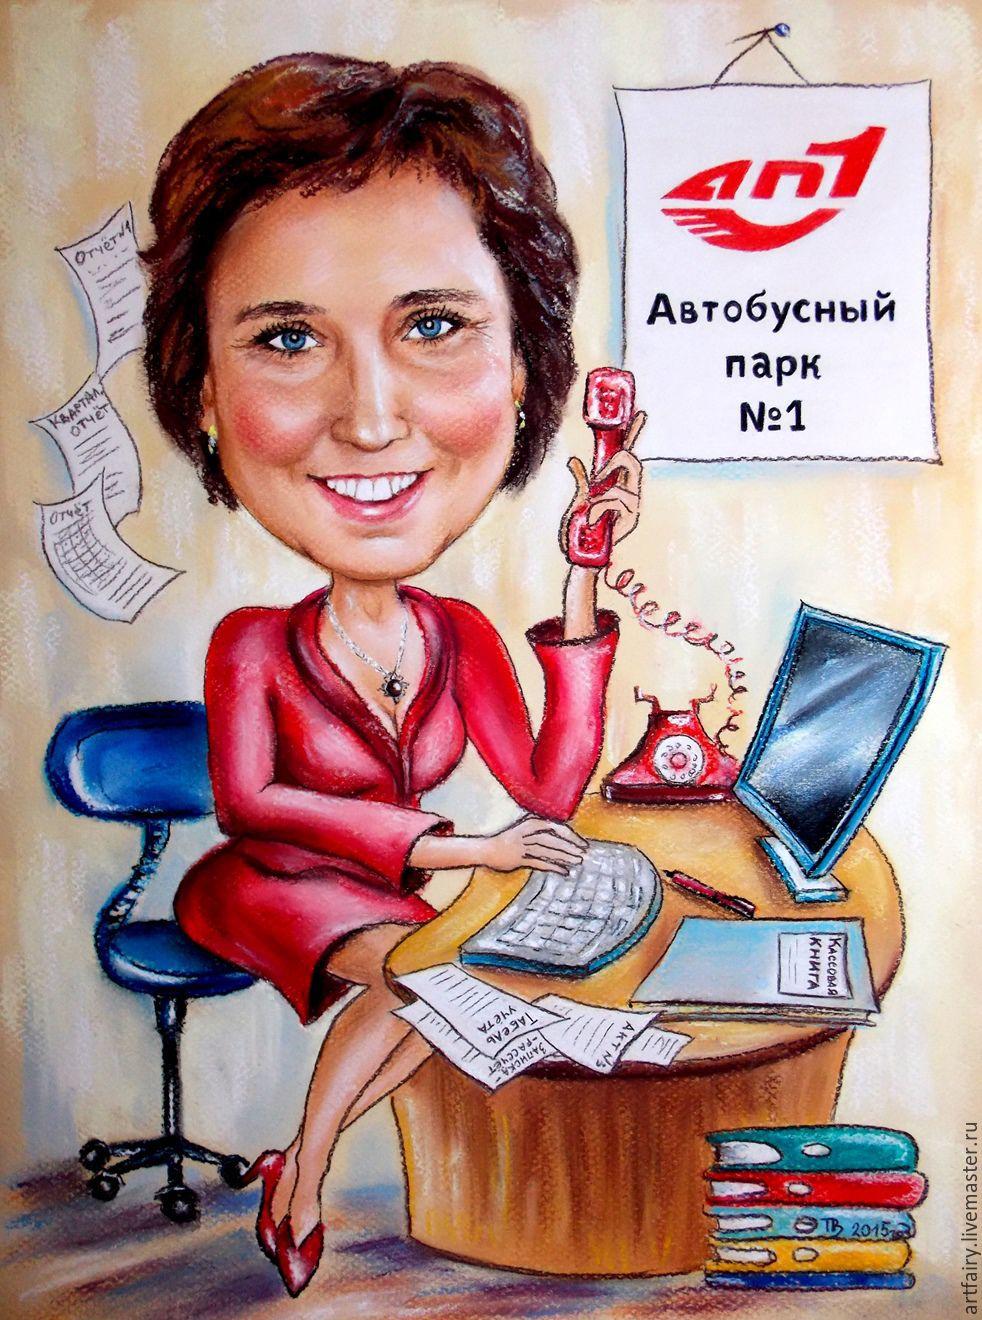 Cartoon business lady 21h30 smerzi custom Gift handmade Gift to a colleague a gift for the boss